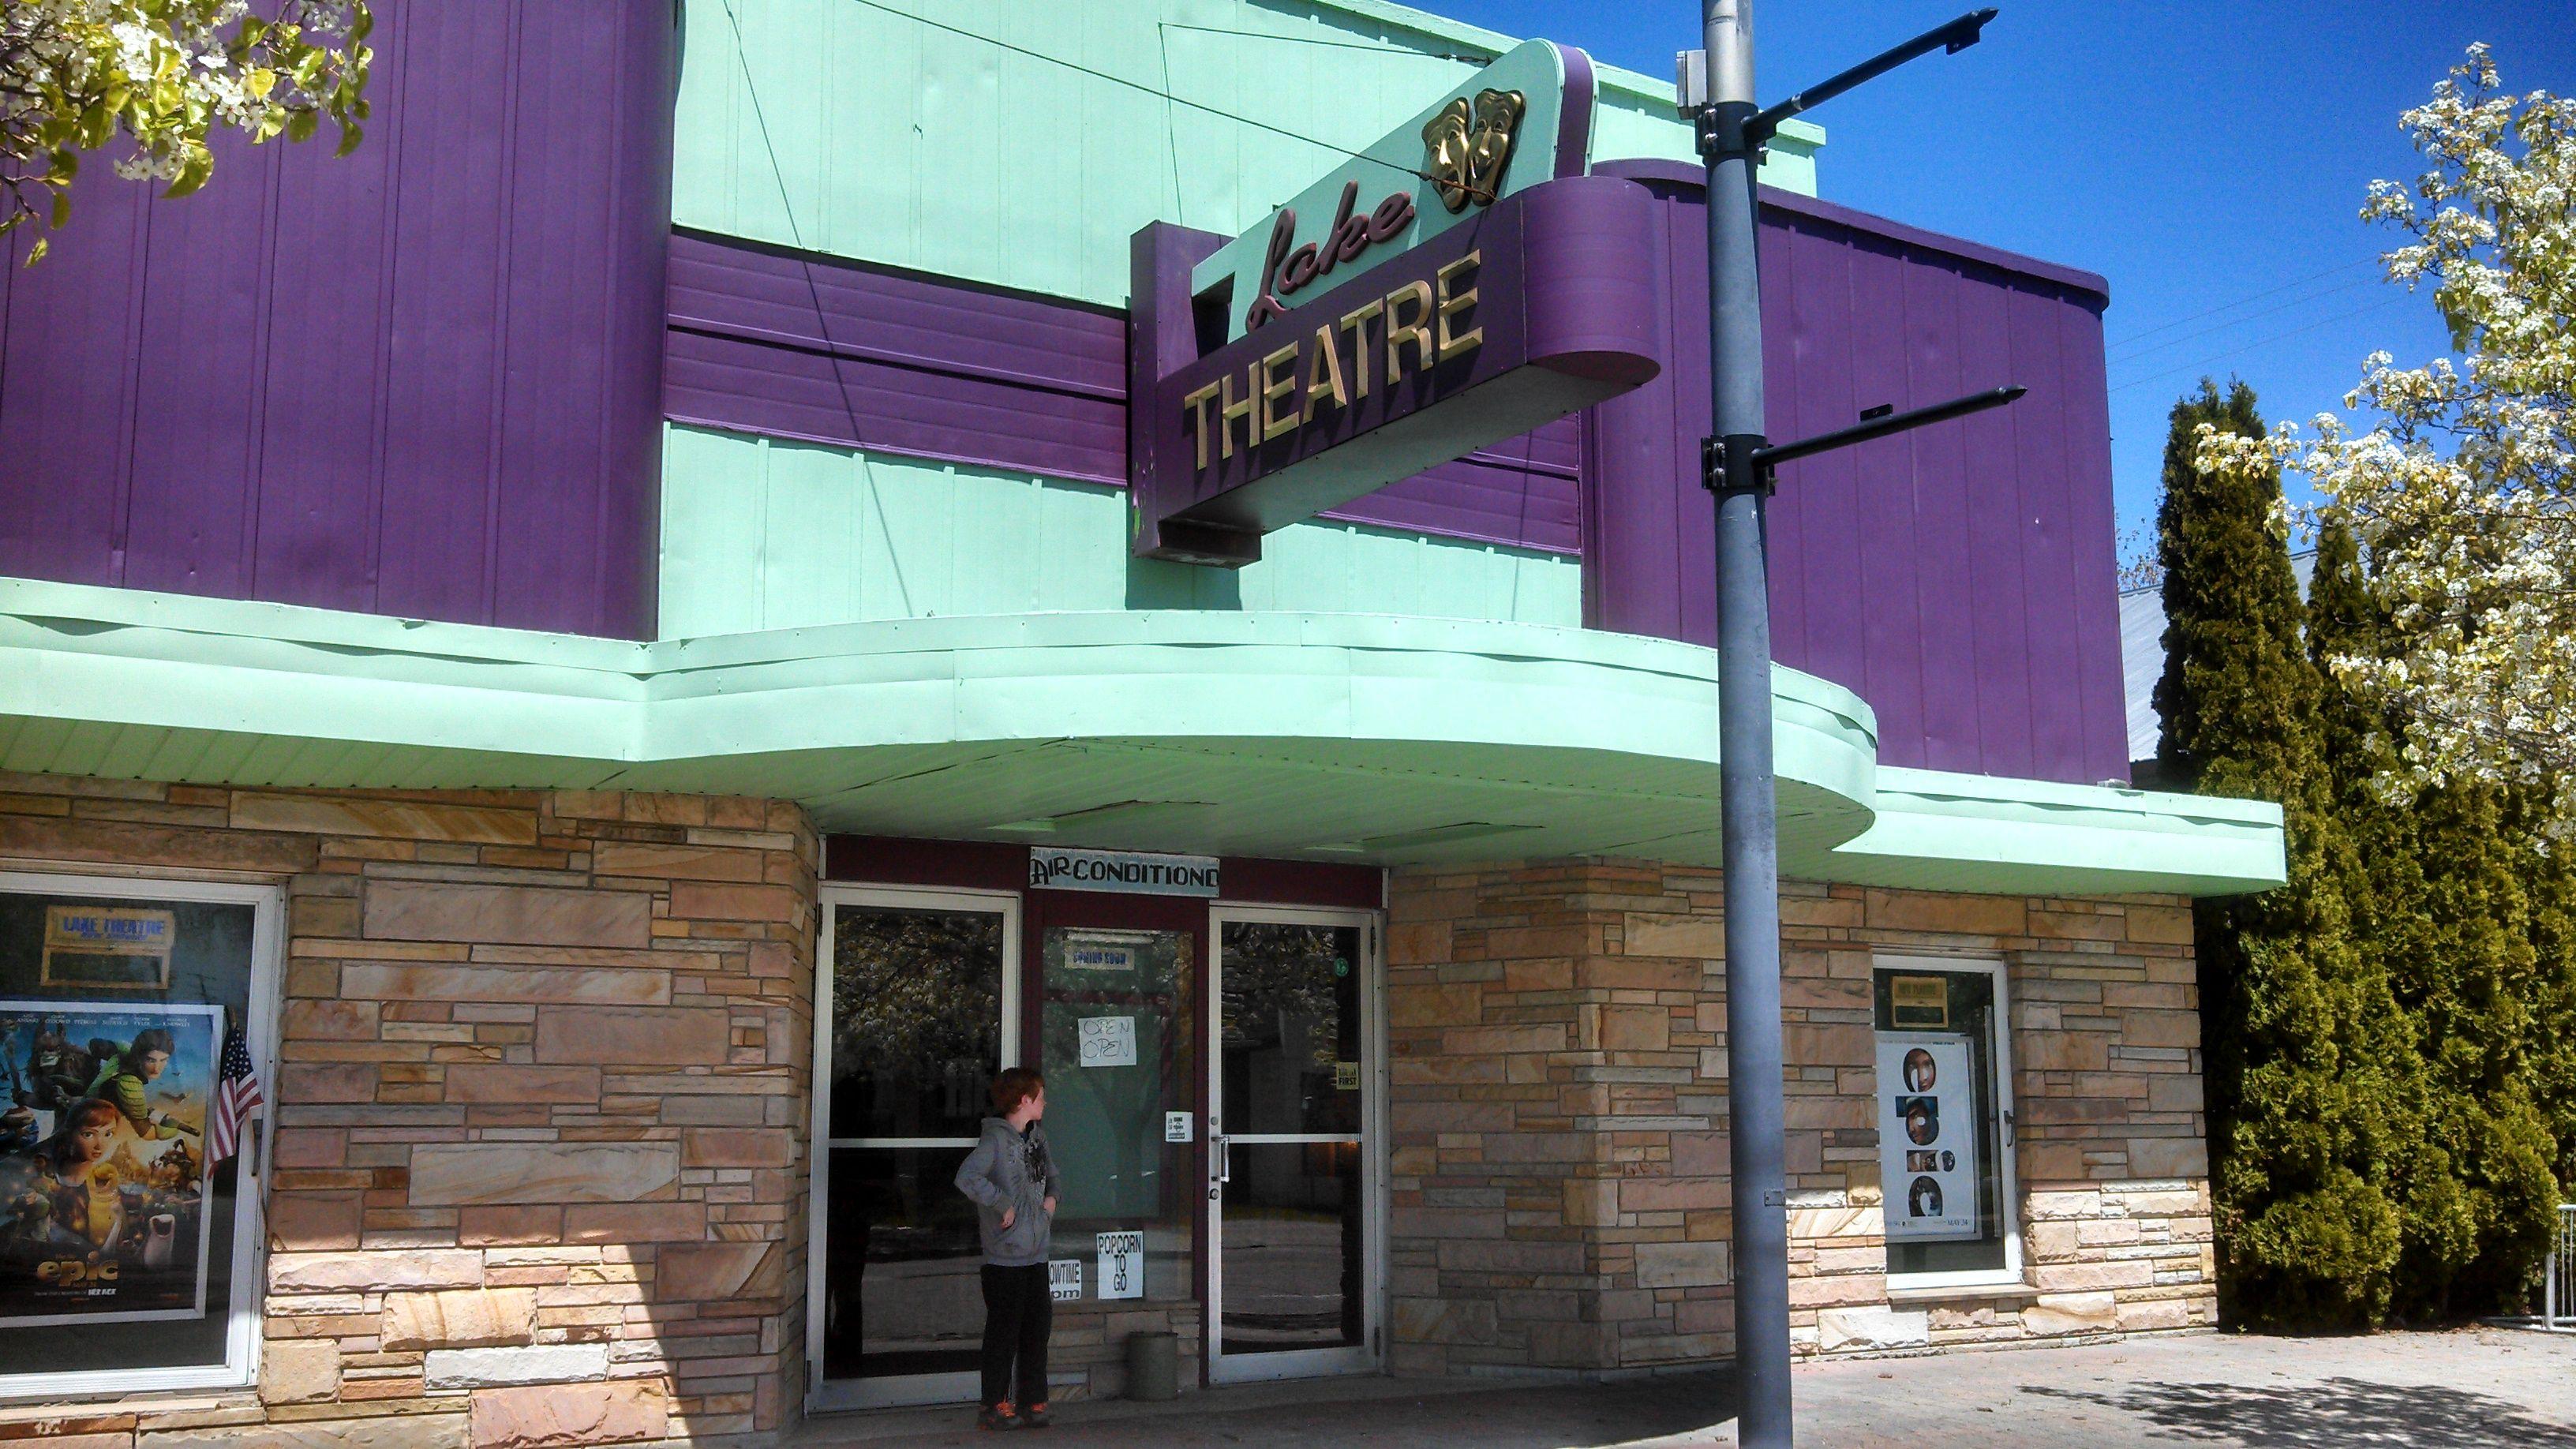 Lake Theatre In Oscoda Michigan Oscoda Broadway Shows Michigan